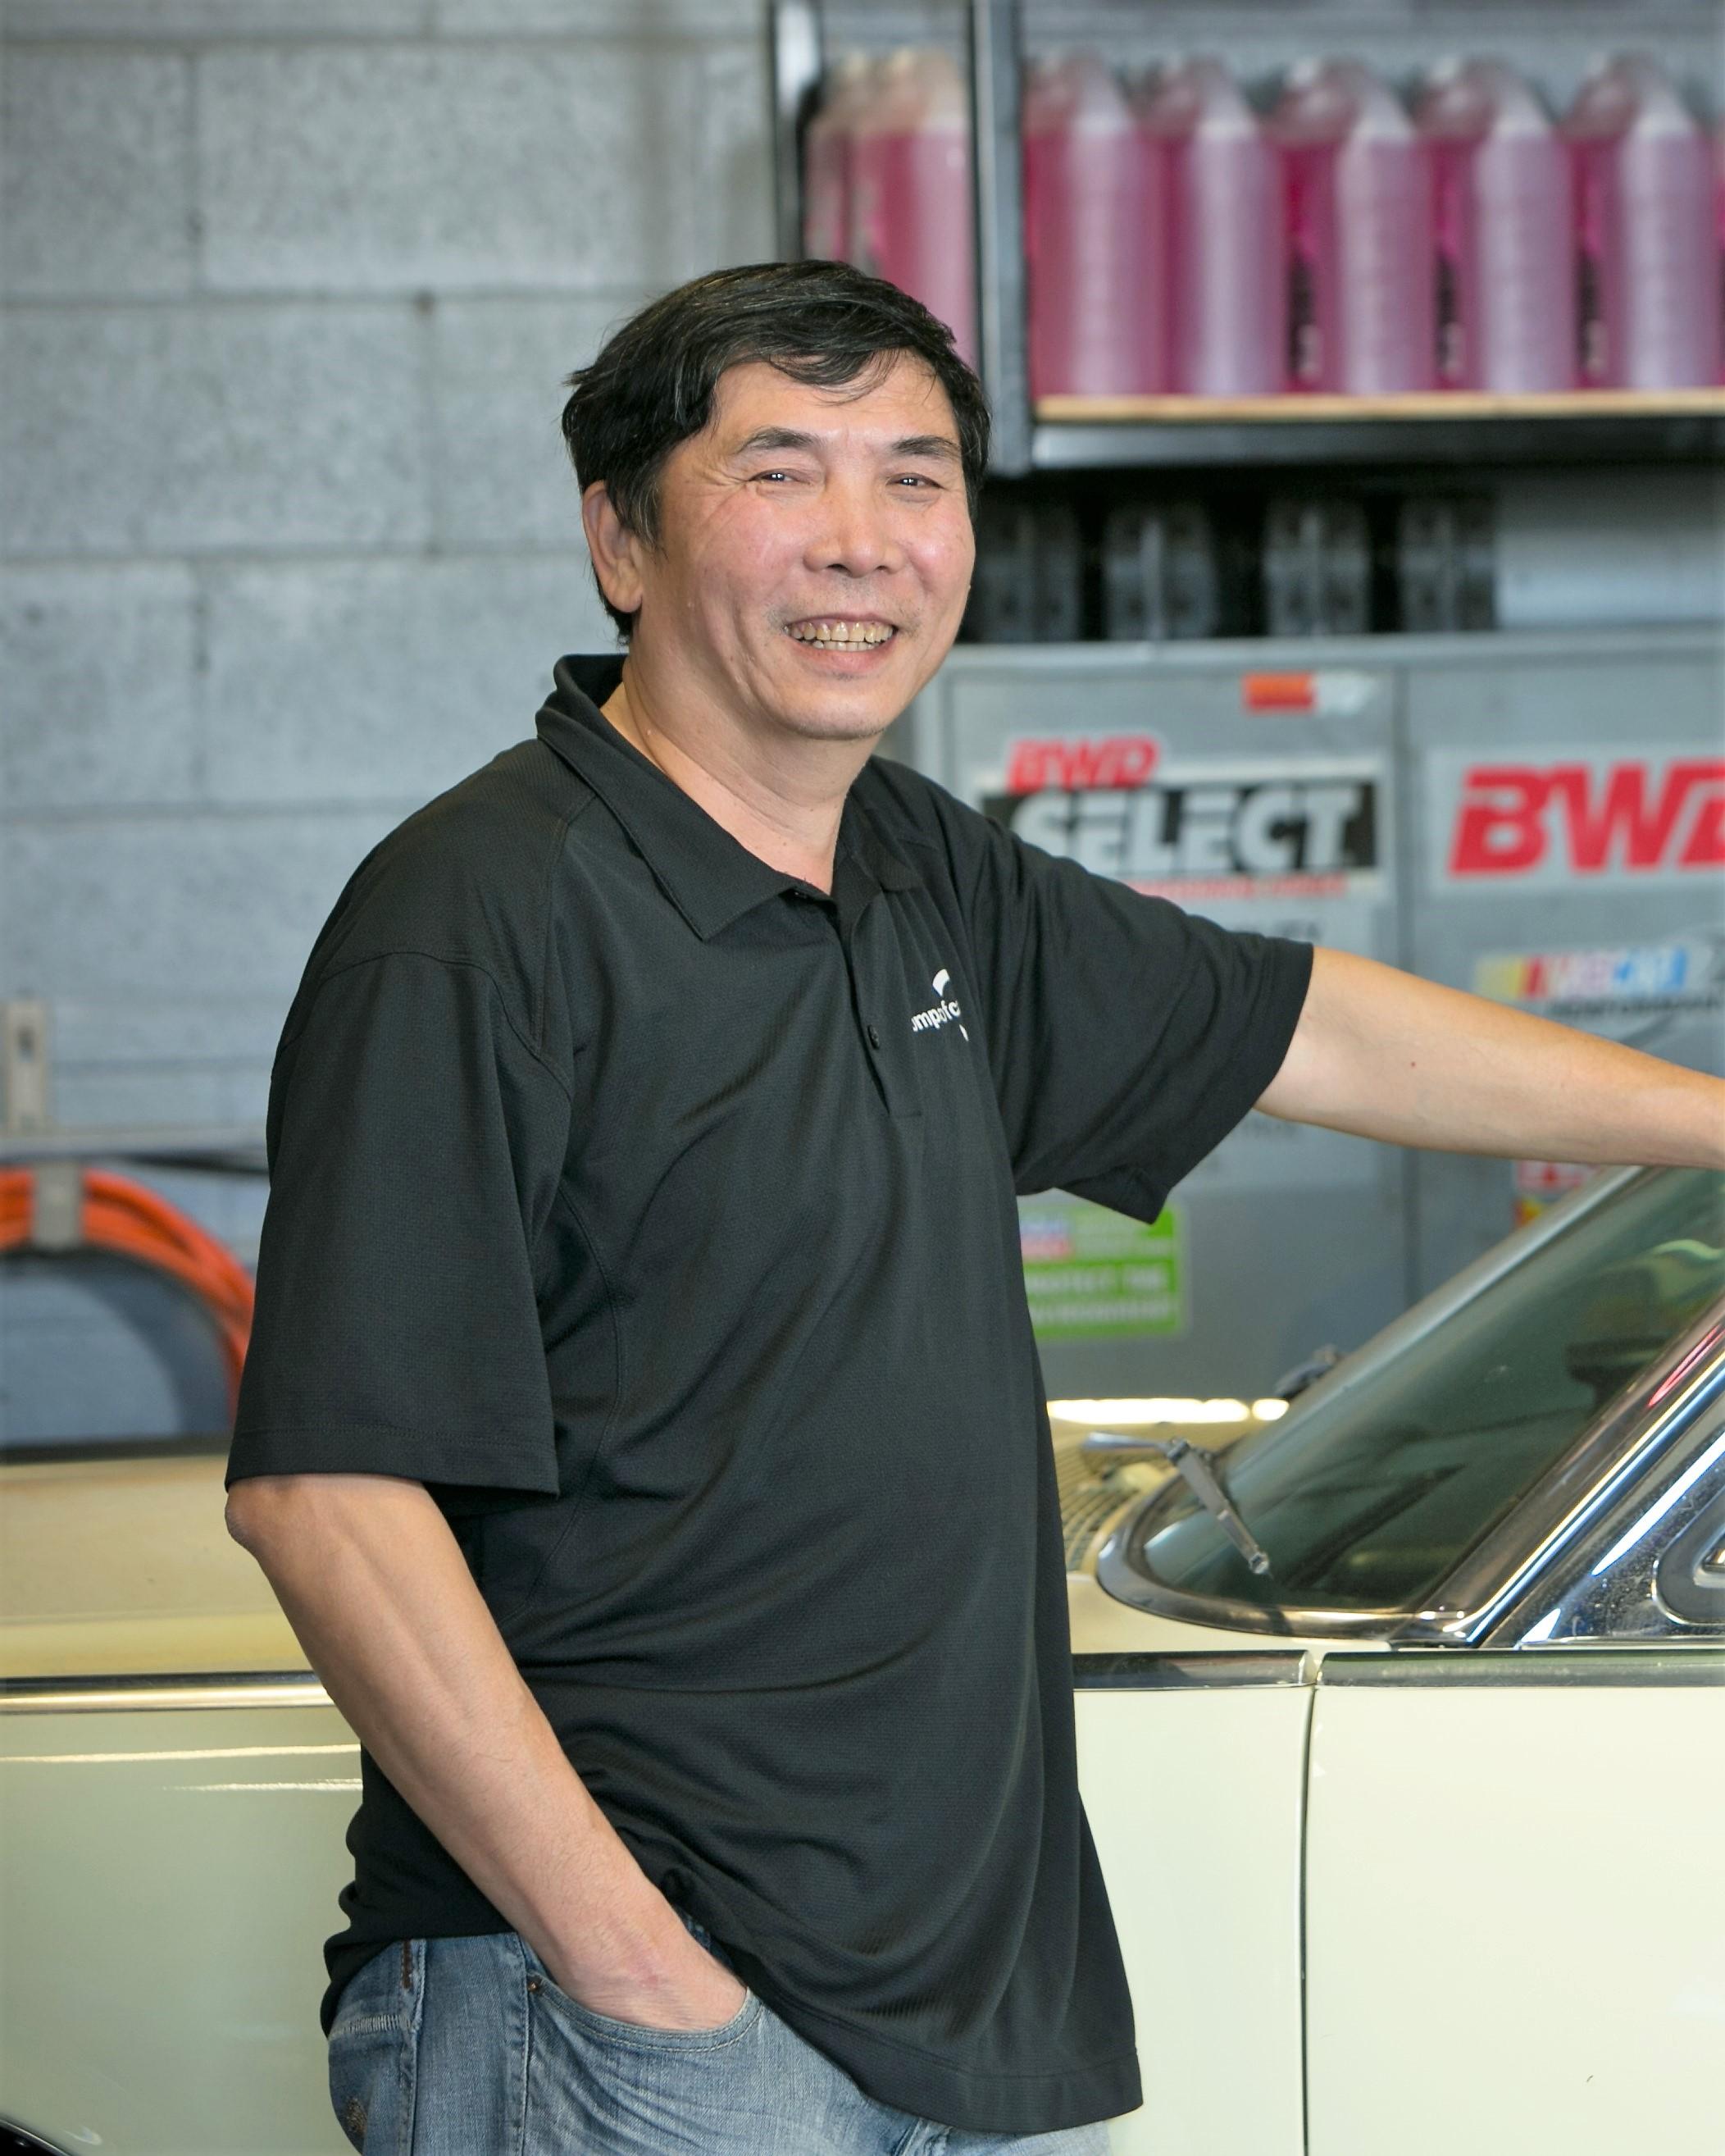 Carl Cui Automotive Service Technician at Company of Cars